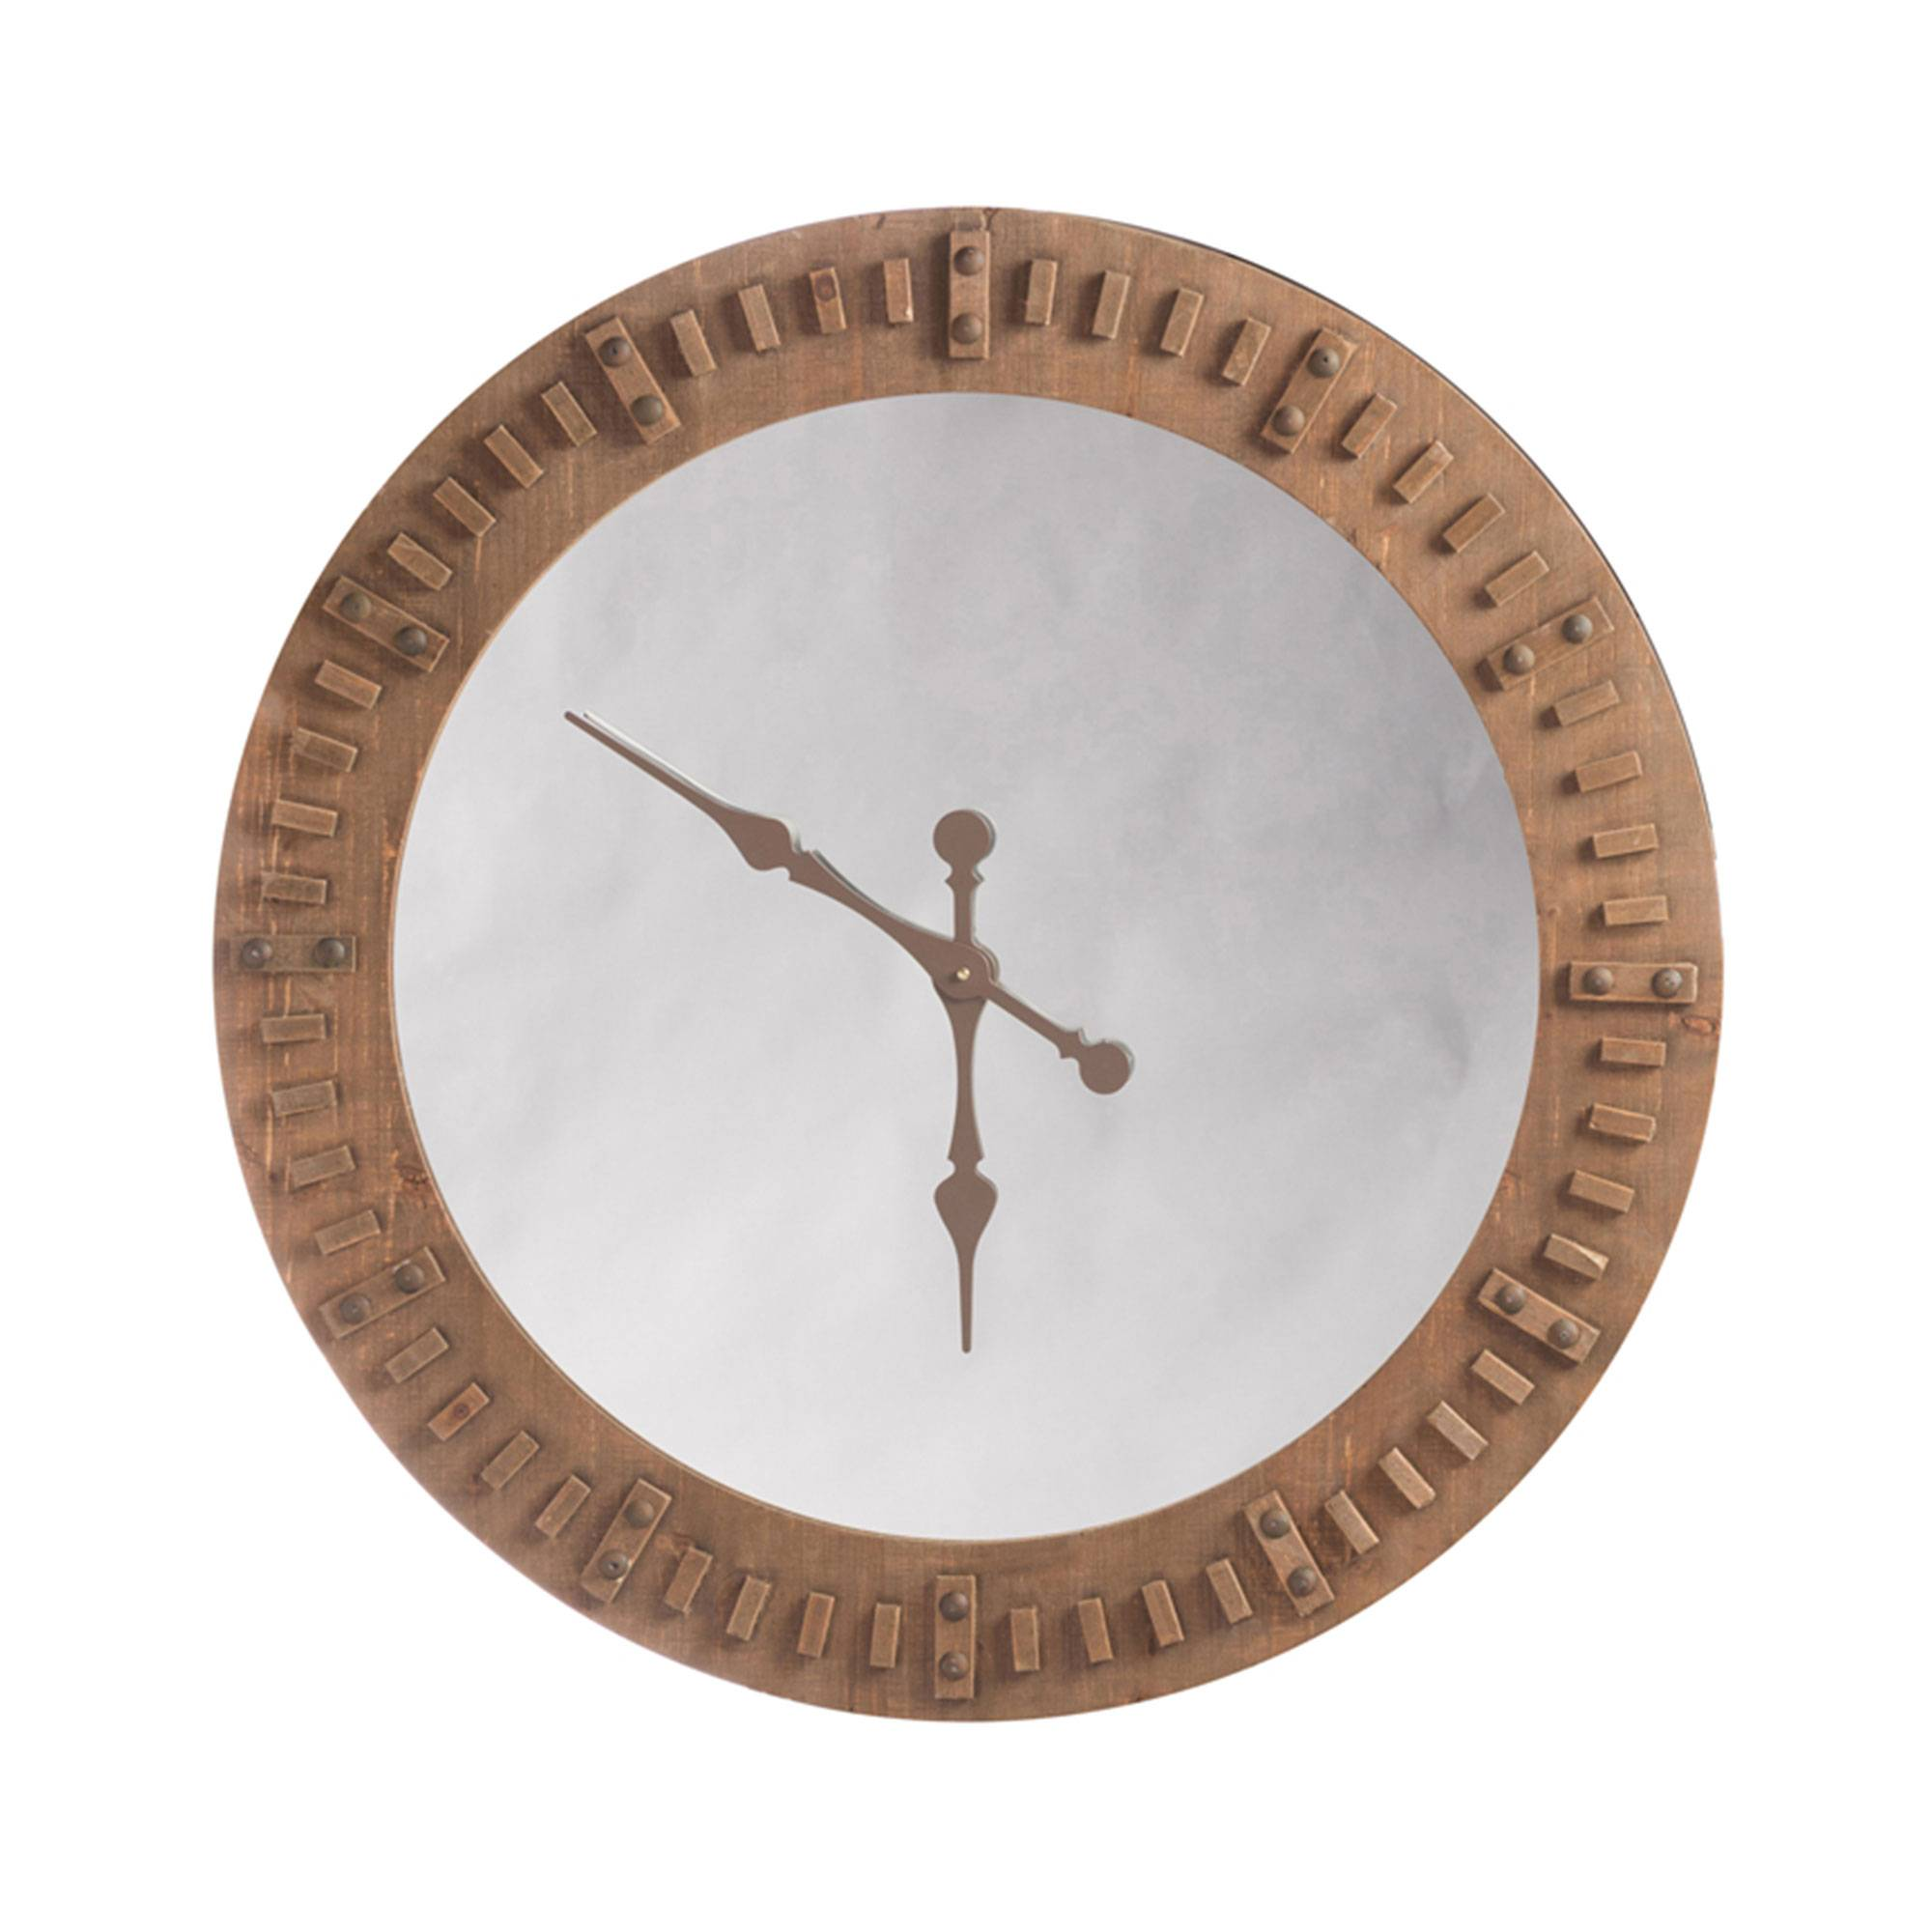 Horloge miroir 119 cm en bois naturel